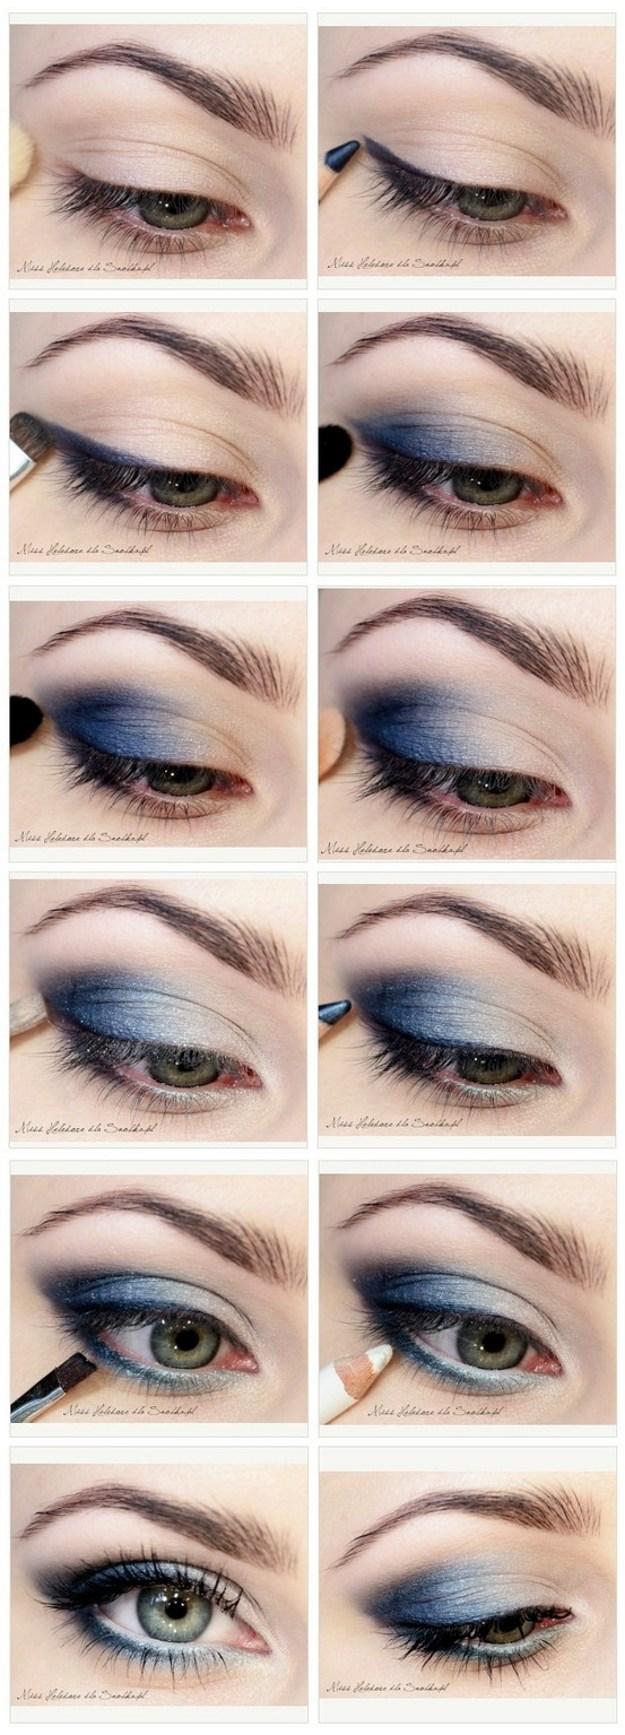 simple eye makeup tutorial for blue eyes | saubhaya makeup